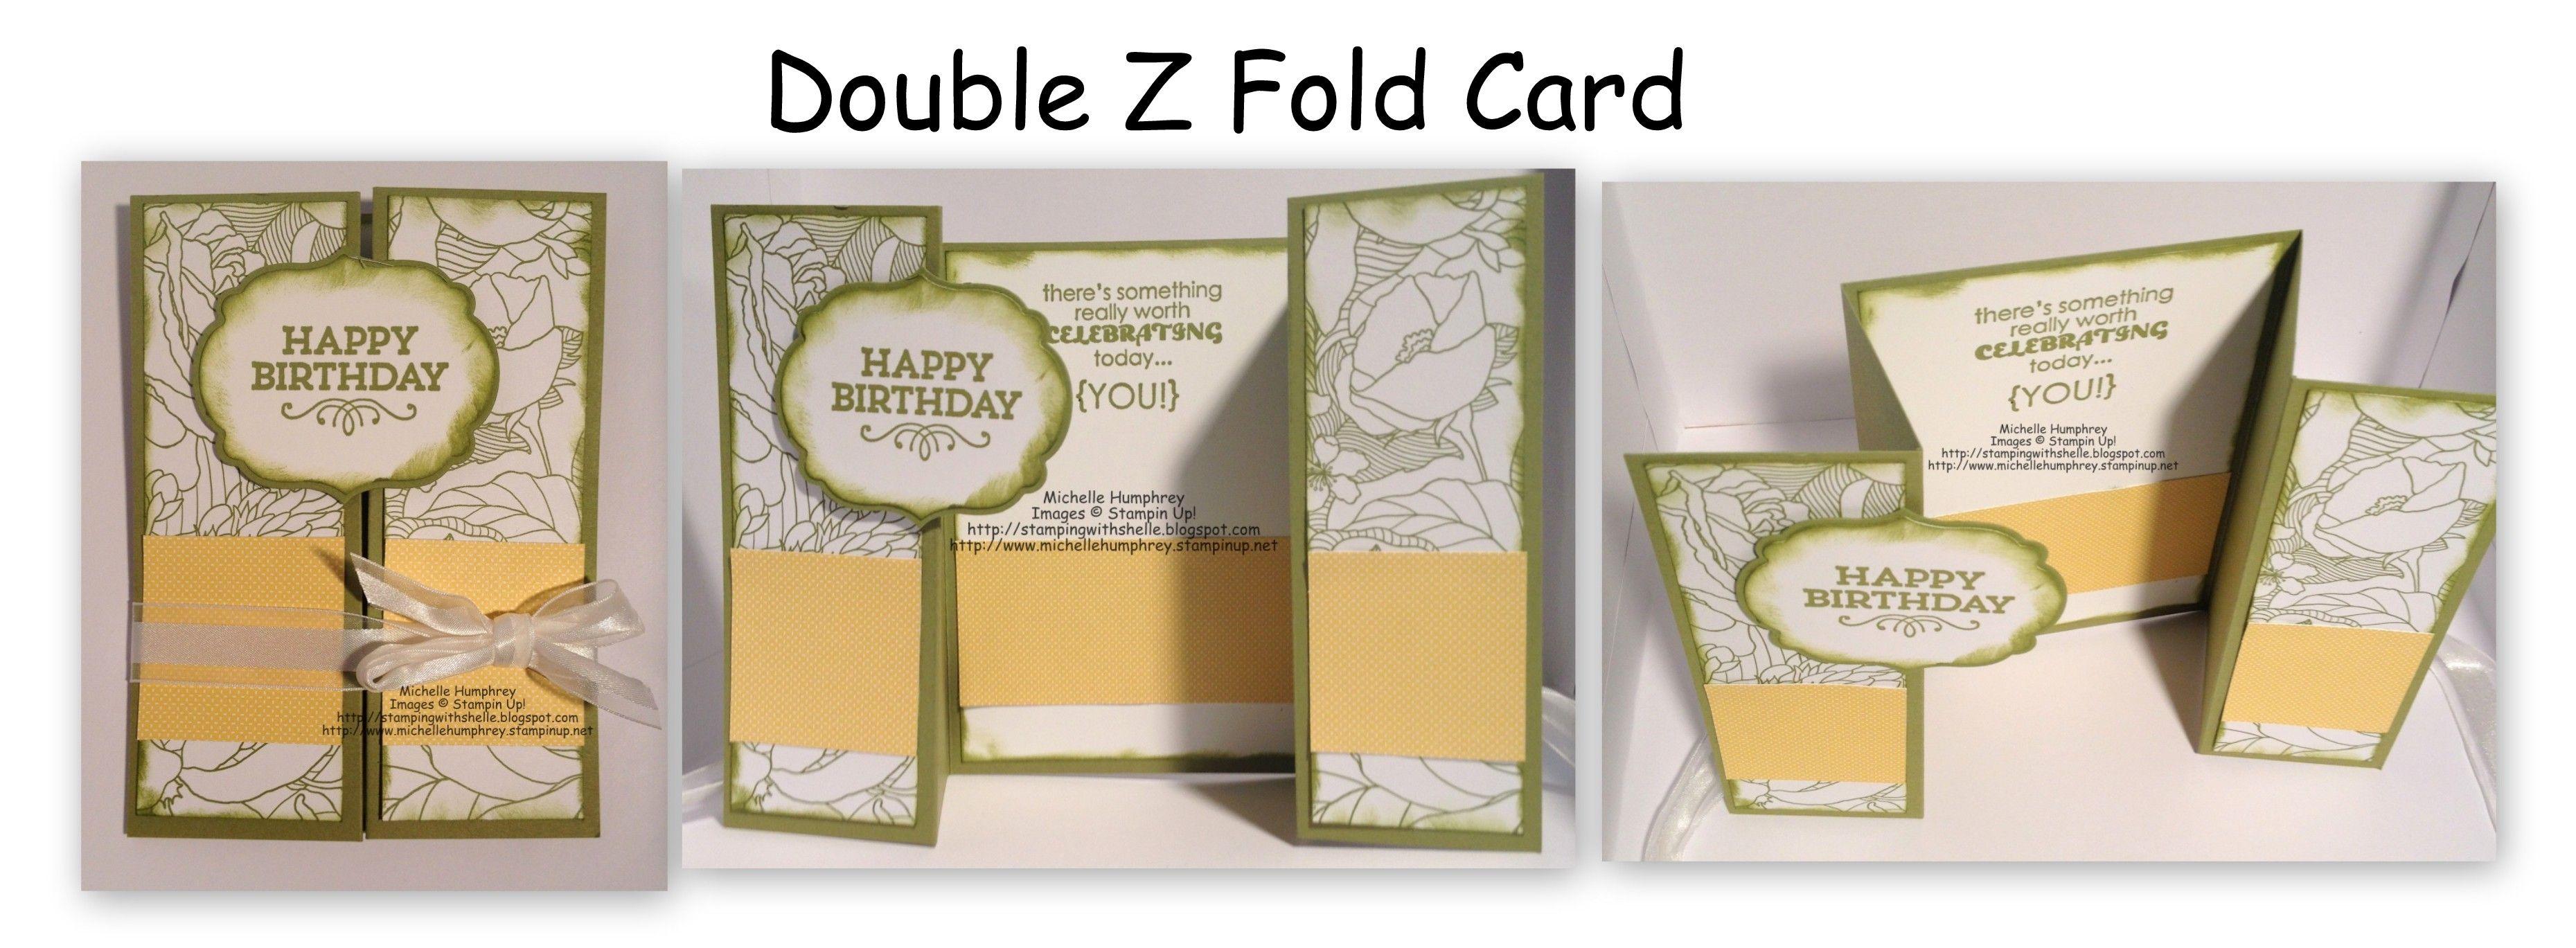 Double Z Fold Card